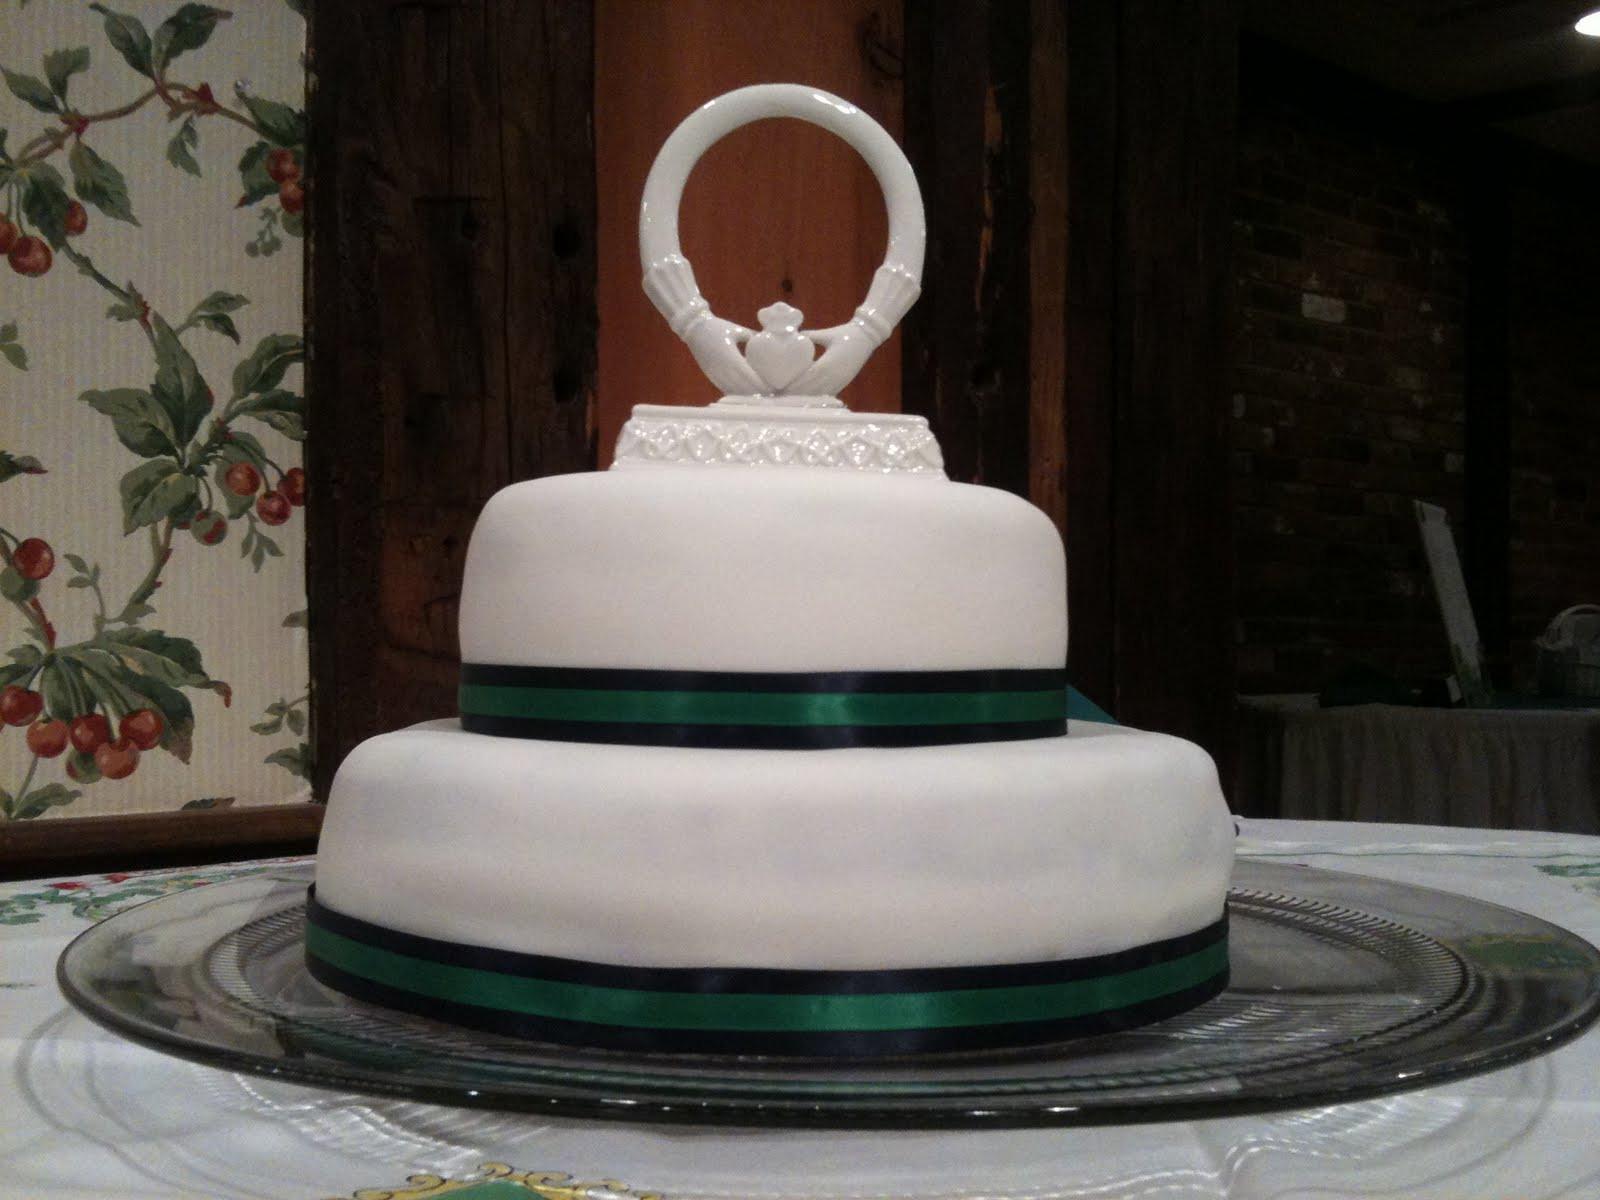 Irish Wedding Cakes  Real McCoy Cakes Irish Wedding Cake March 2011